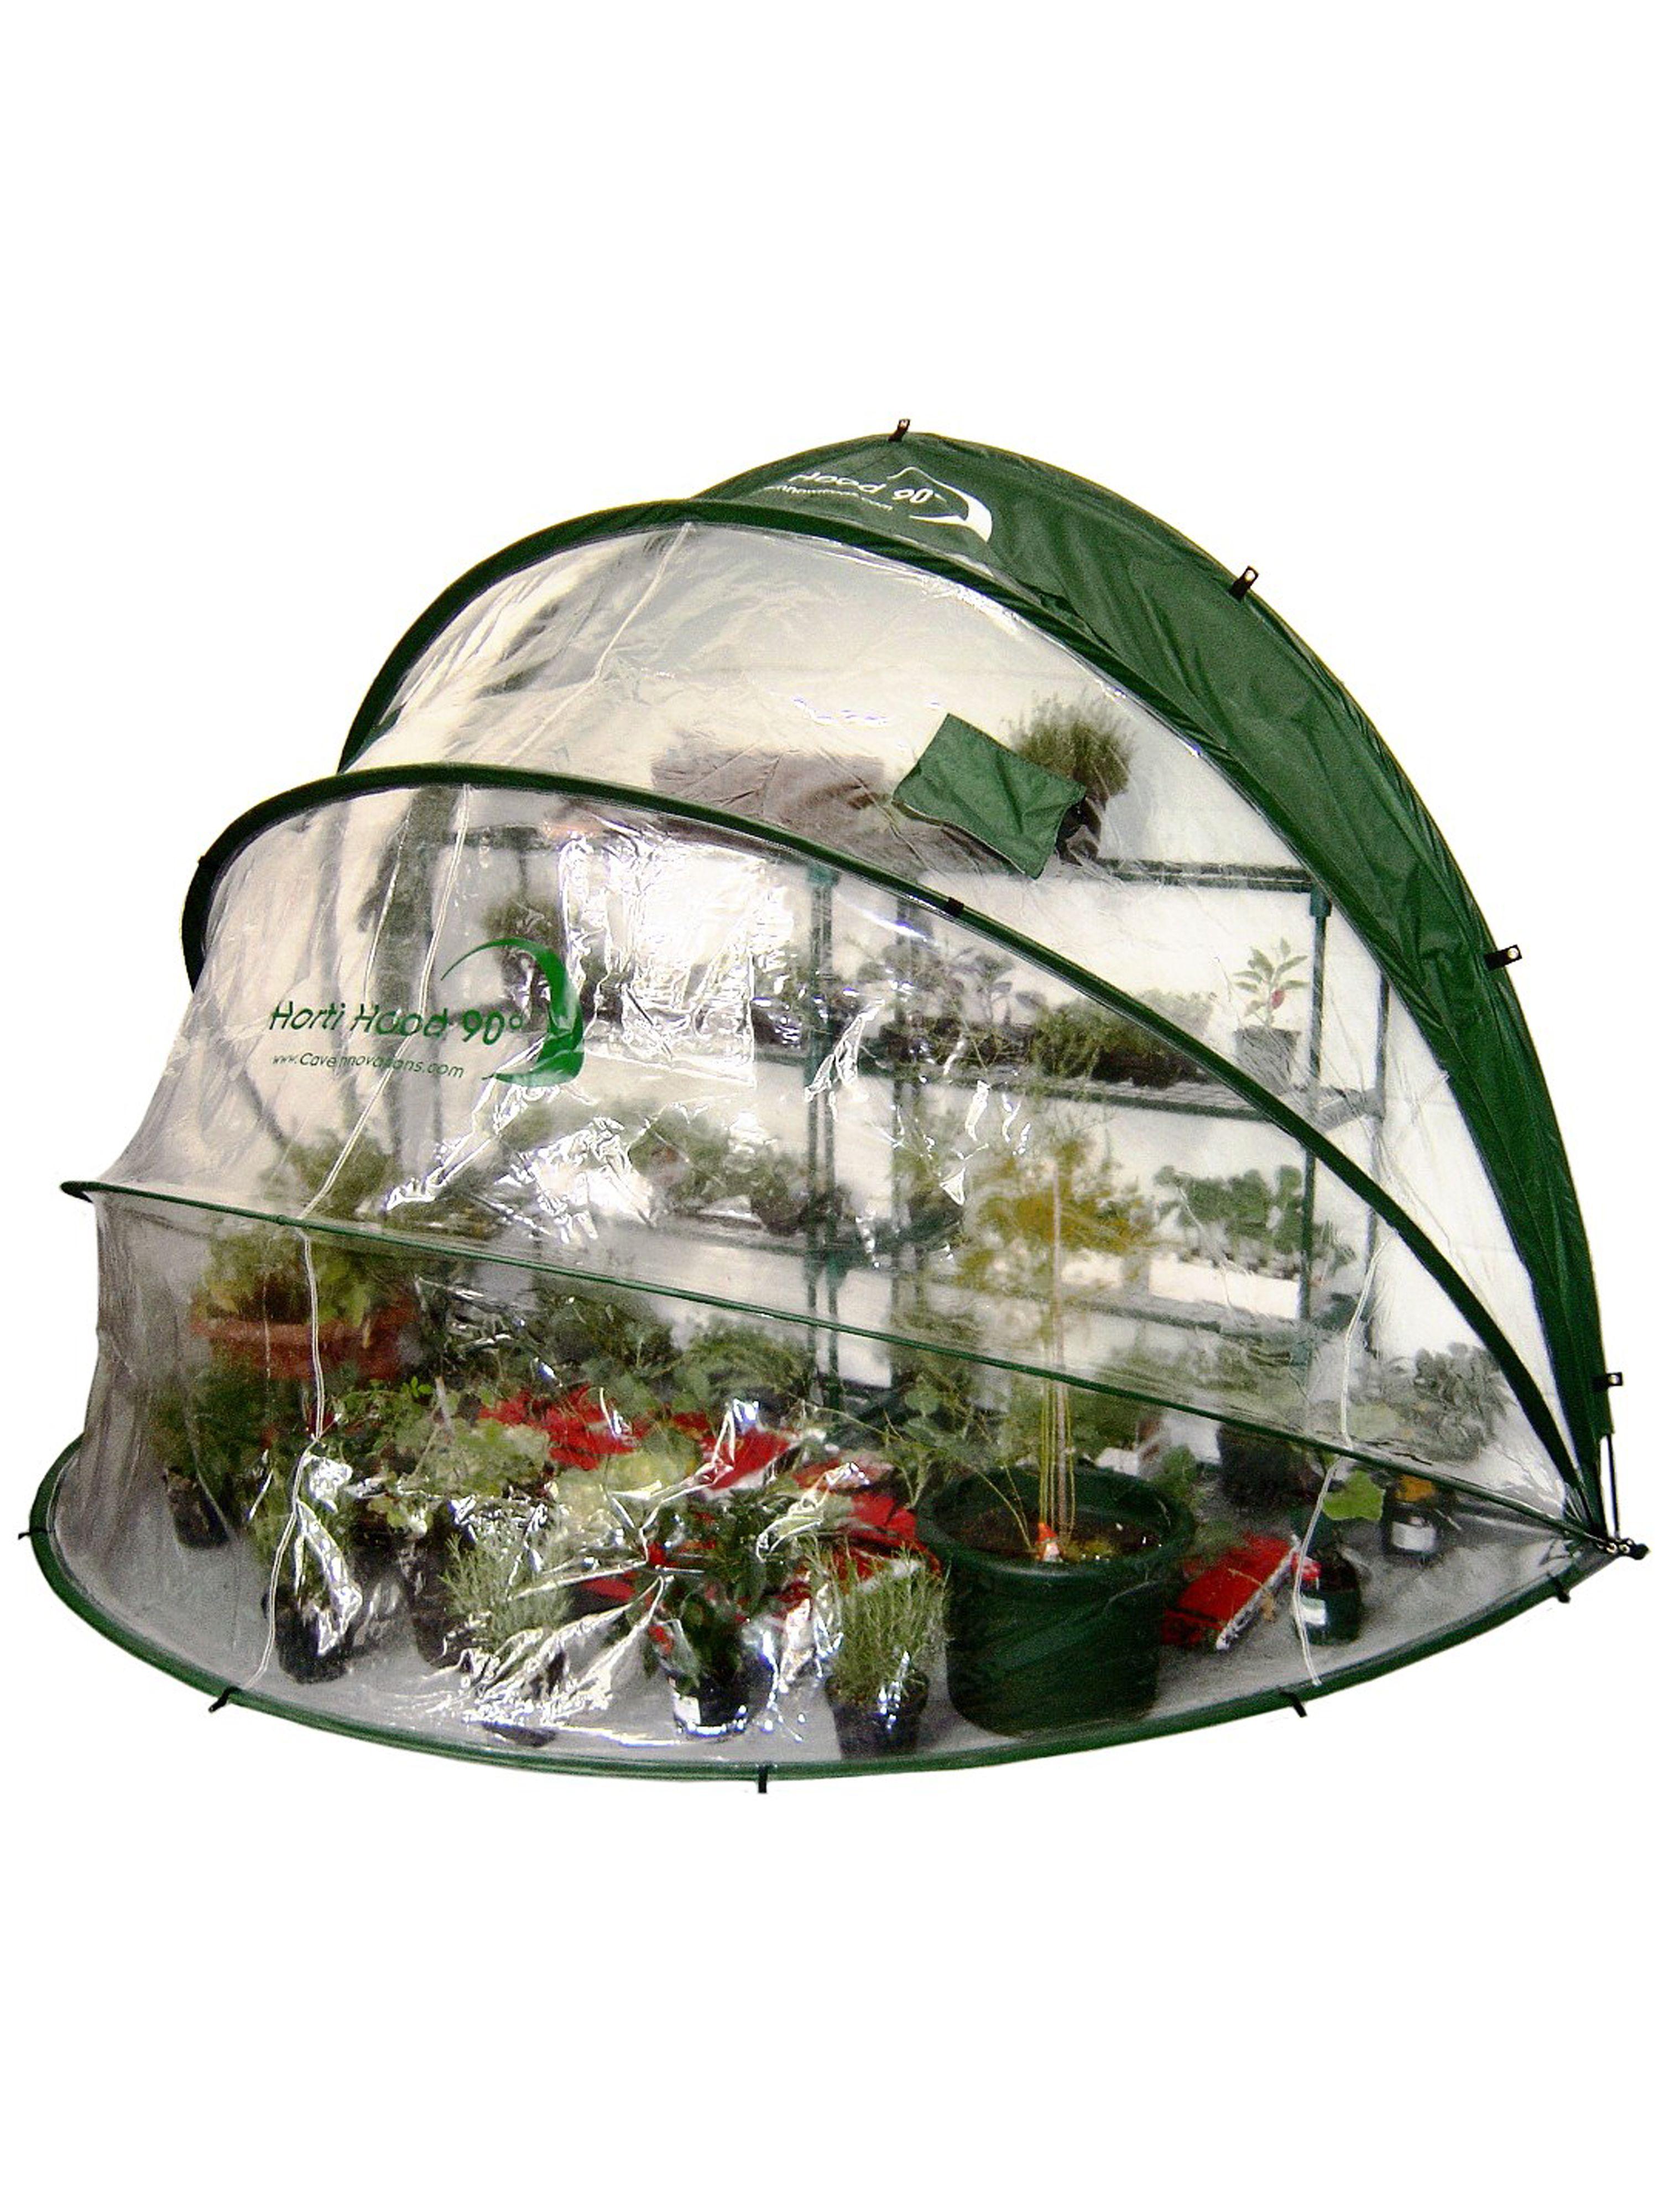 horti hood pop up greenhouse 90 patio greenhouse i. Black Bedroom Furniture Sets. Home Design Ideas